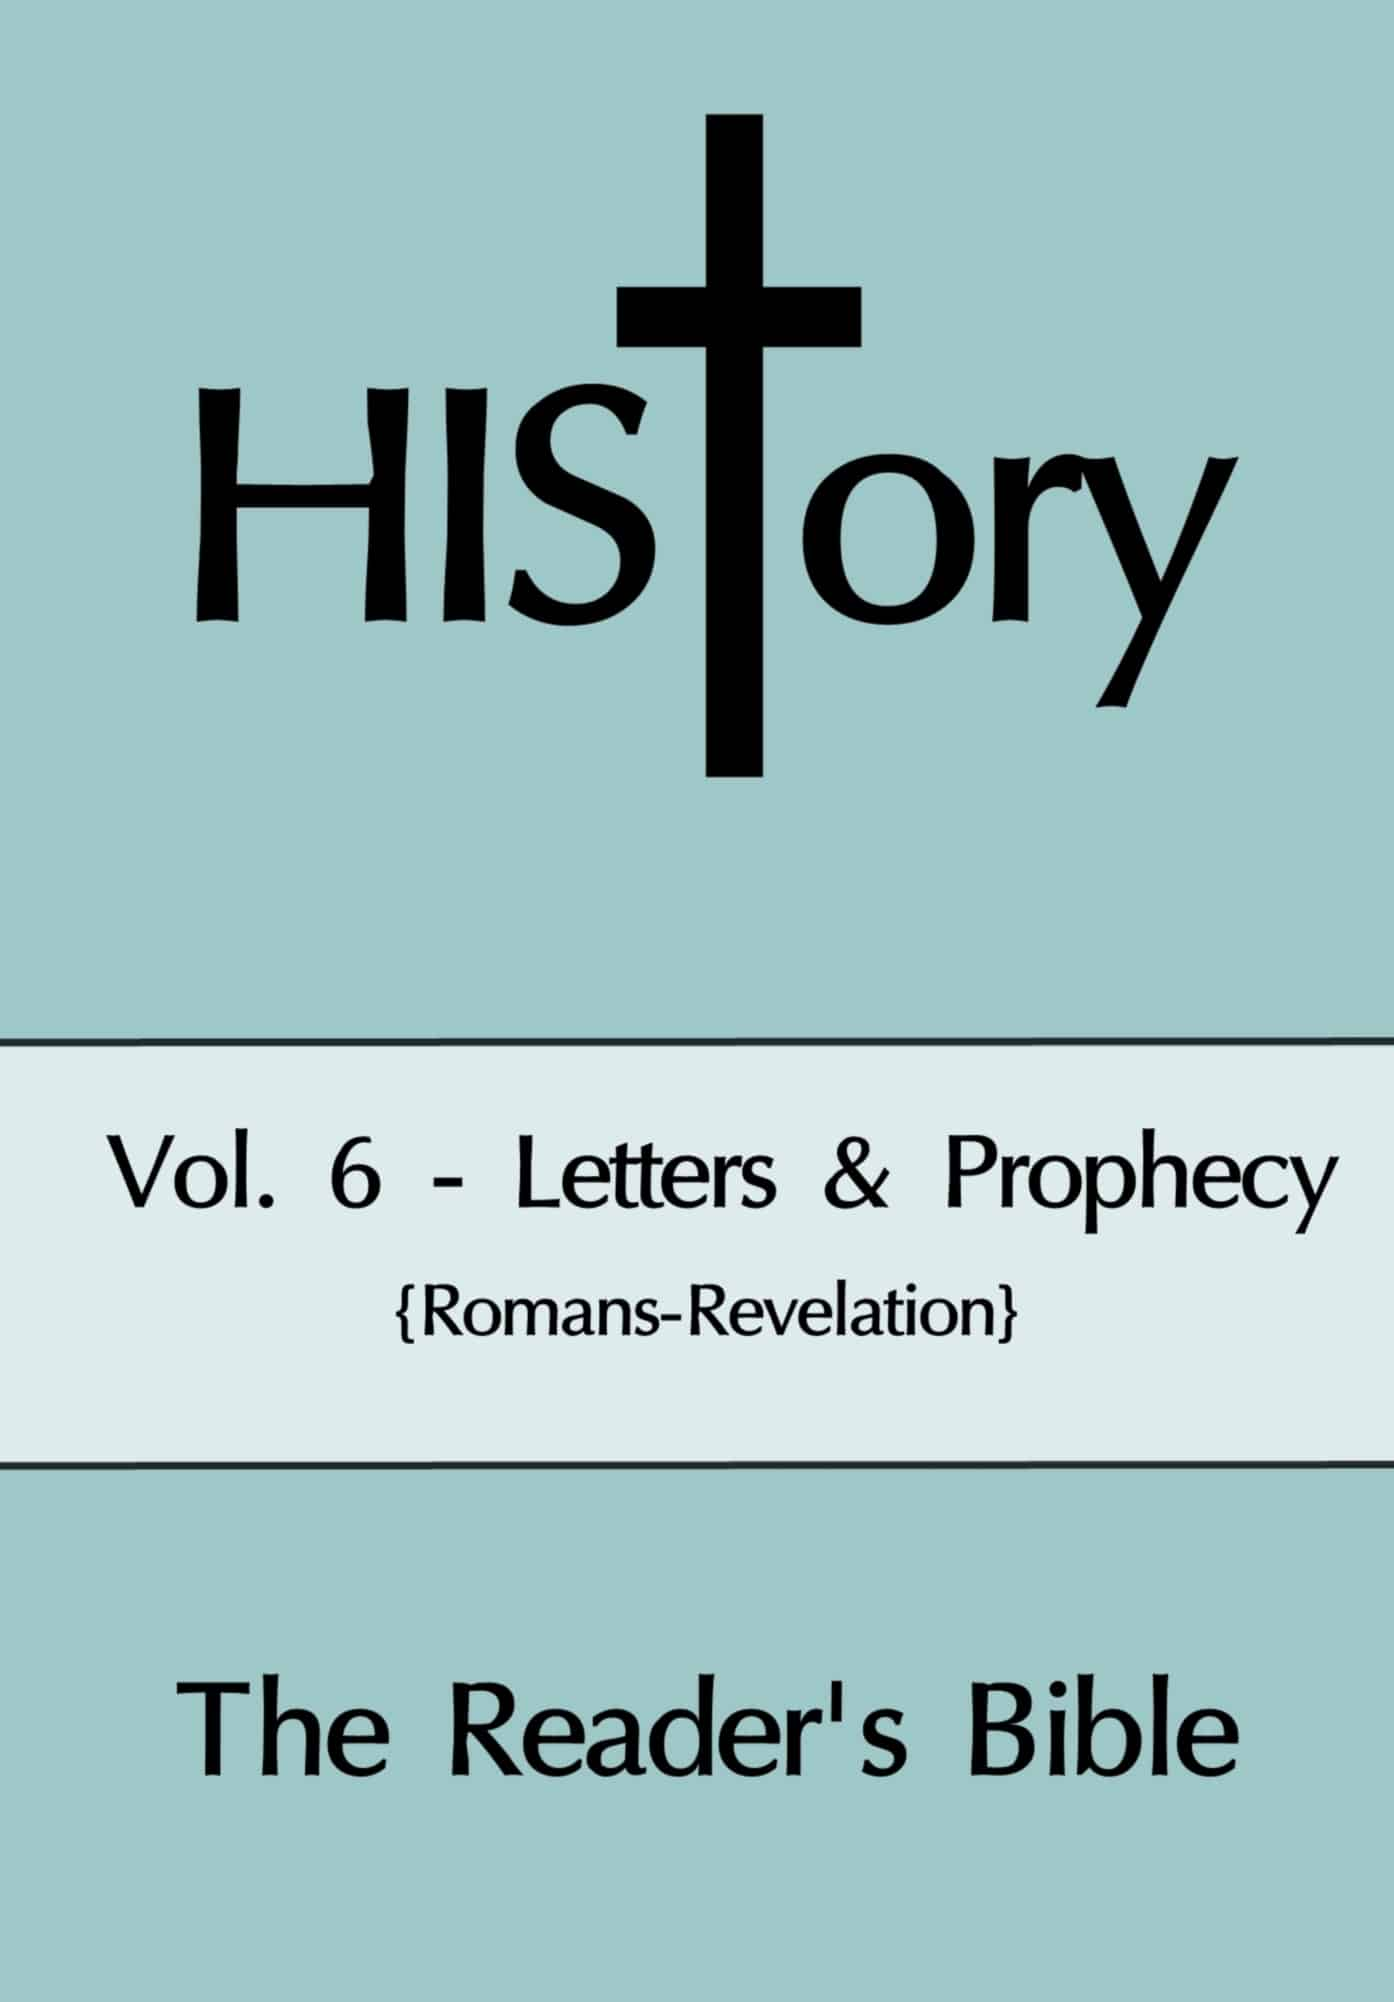 HIStory: The Reader's Bible Vol. 6 - Letters & Prophecy {Romans-Revelation}